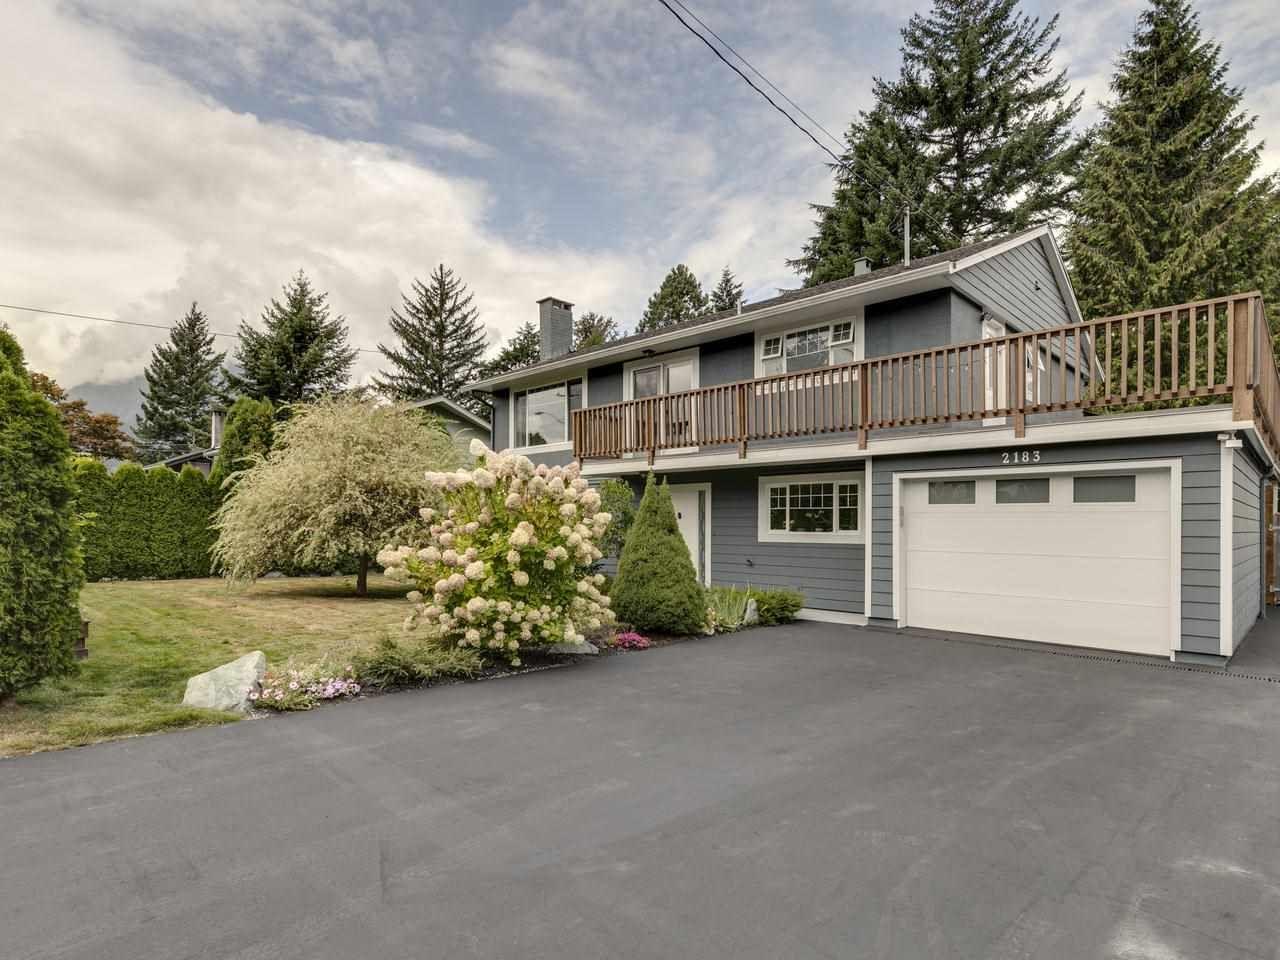 "Main Photo: 2183 SKYLINE Drive in Squamish: Garibaldi Highlands House for sale in ""Garibaldi Estates"" : MLS®# R2403833"